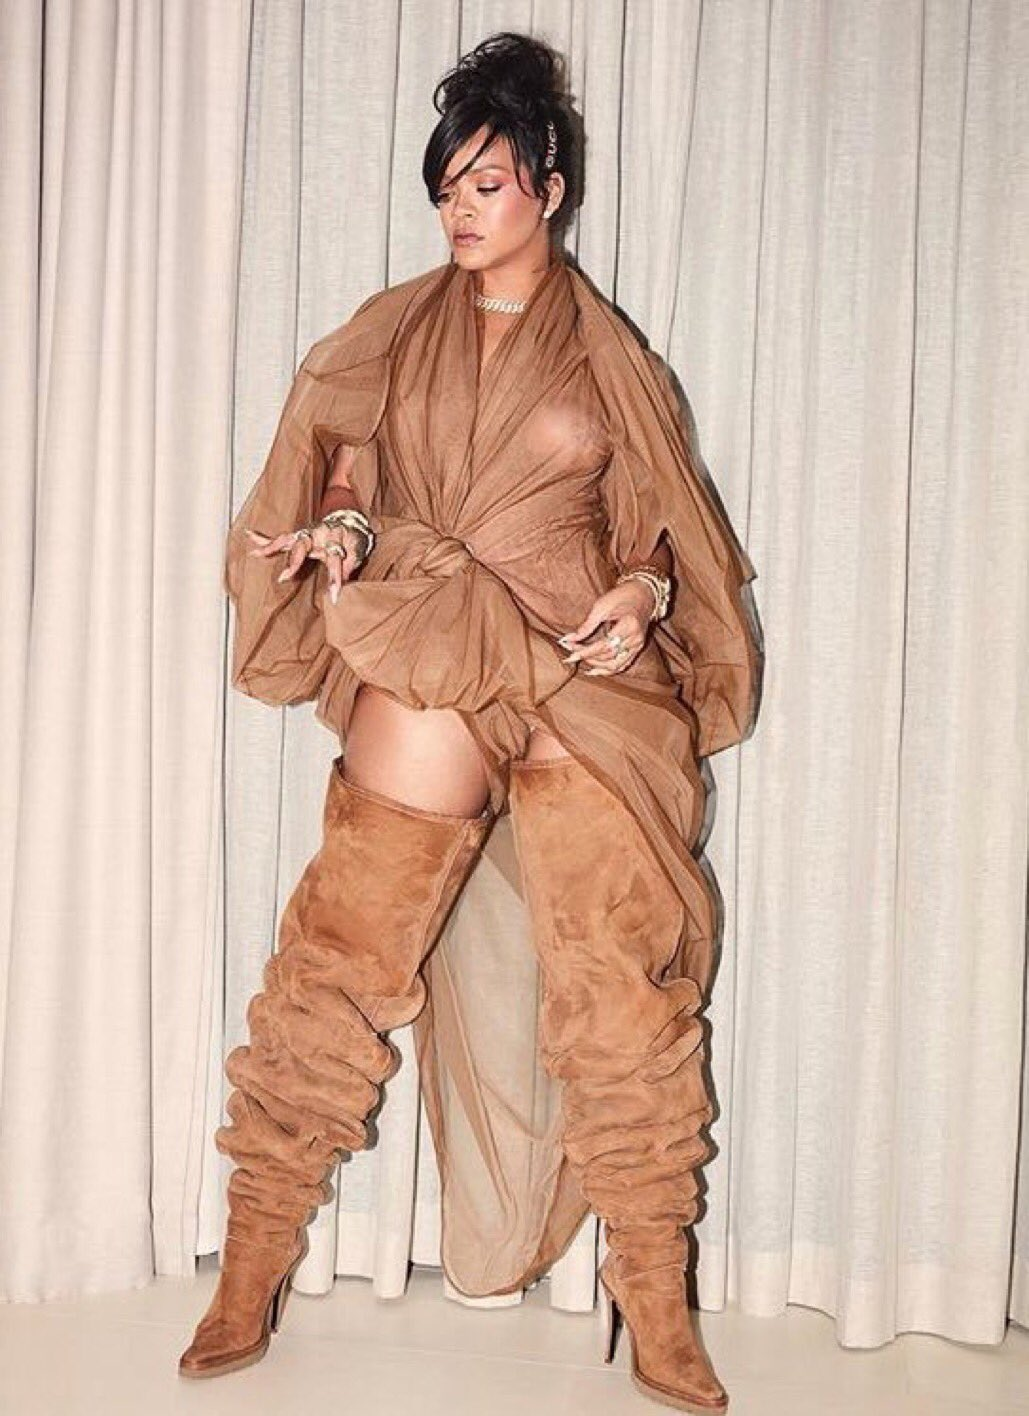 @Rihanna did not come to play. #Coachella18 https://t.co/vfIV9U7IPK